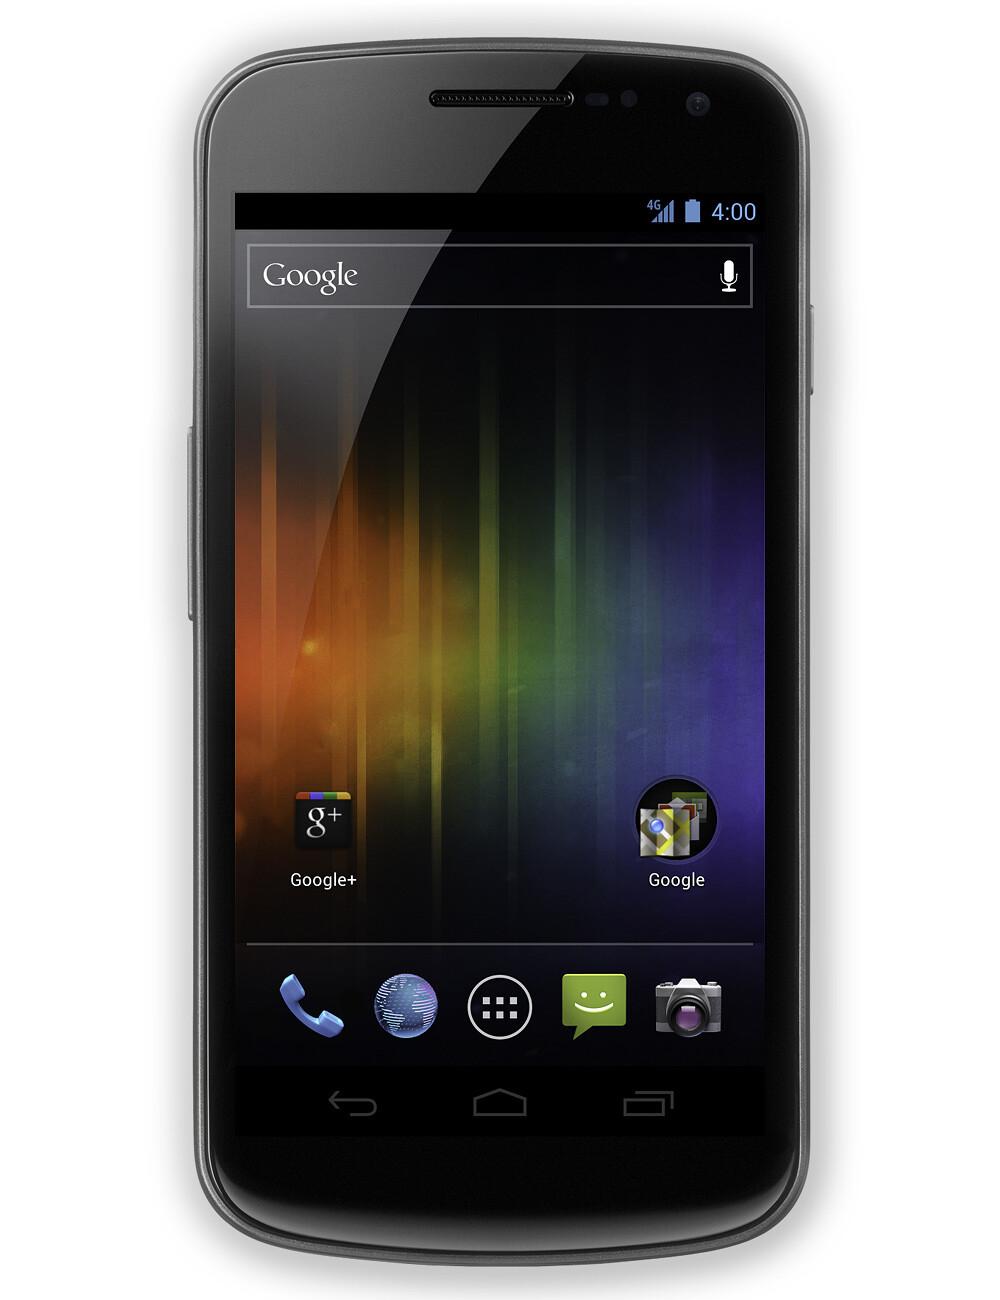 Samsung GALAXY Nexus CDMA specs